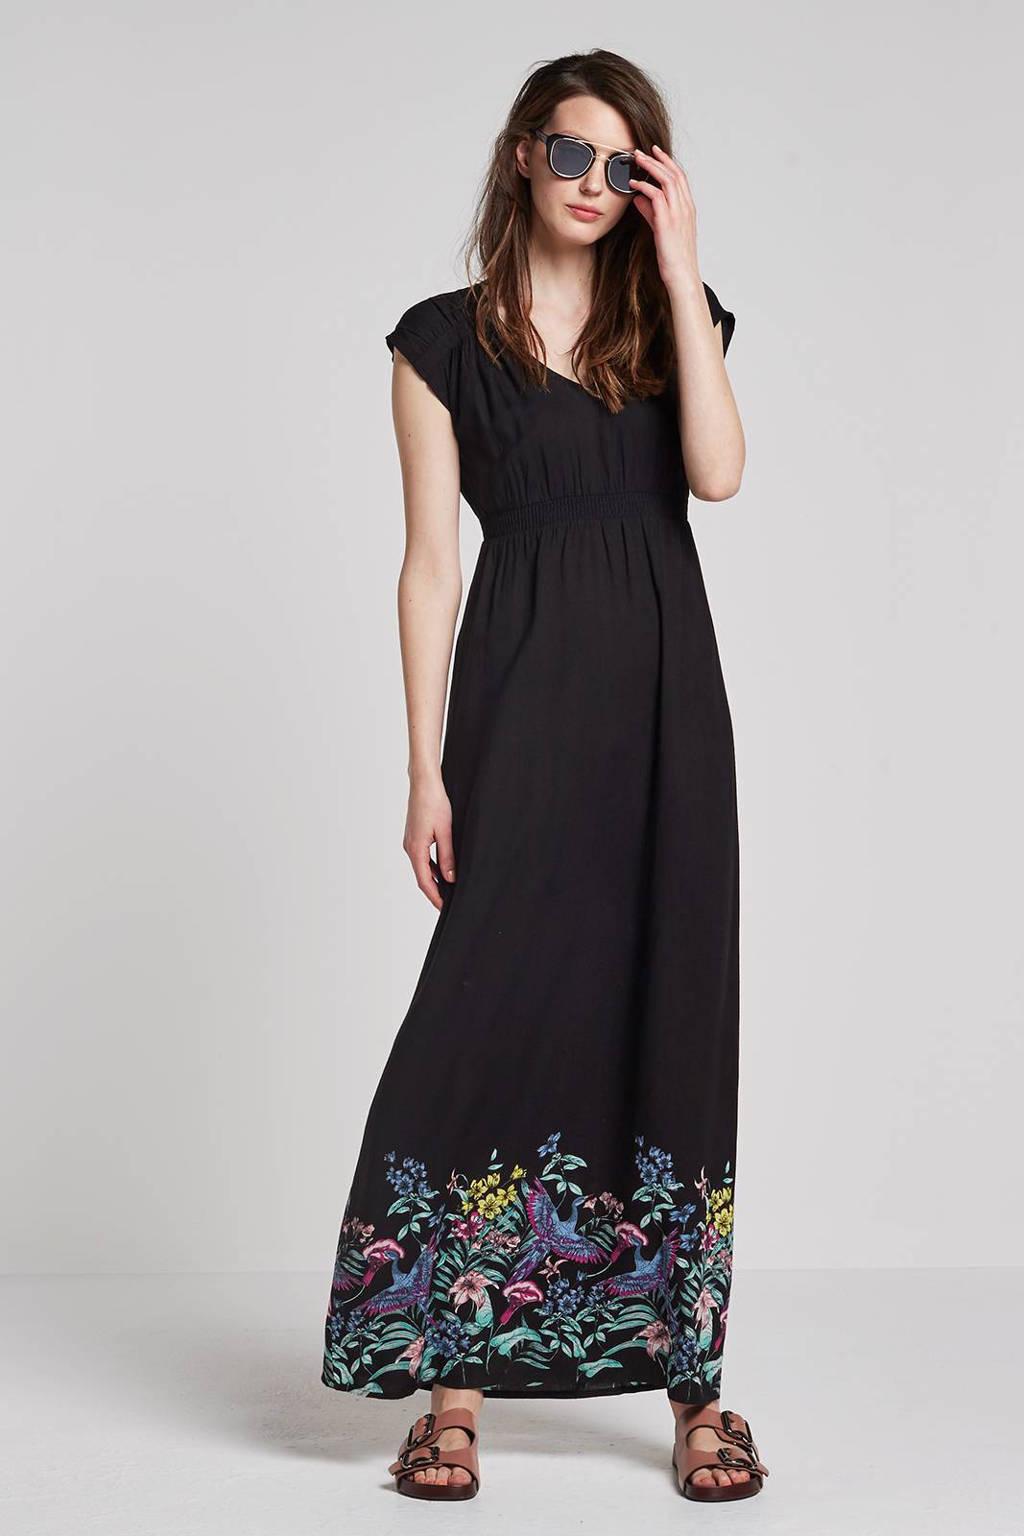 whkmp's beachwave maxi jurk met bloemenprint, Zwart/groen/blauw